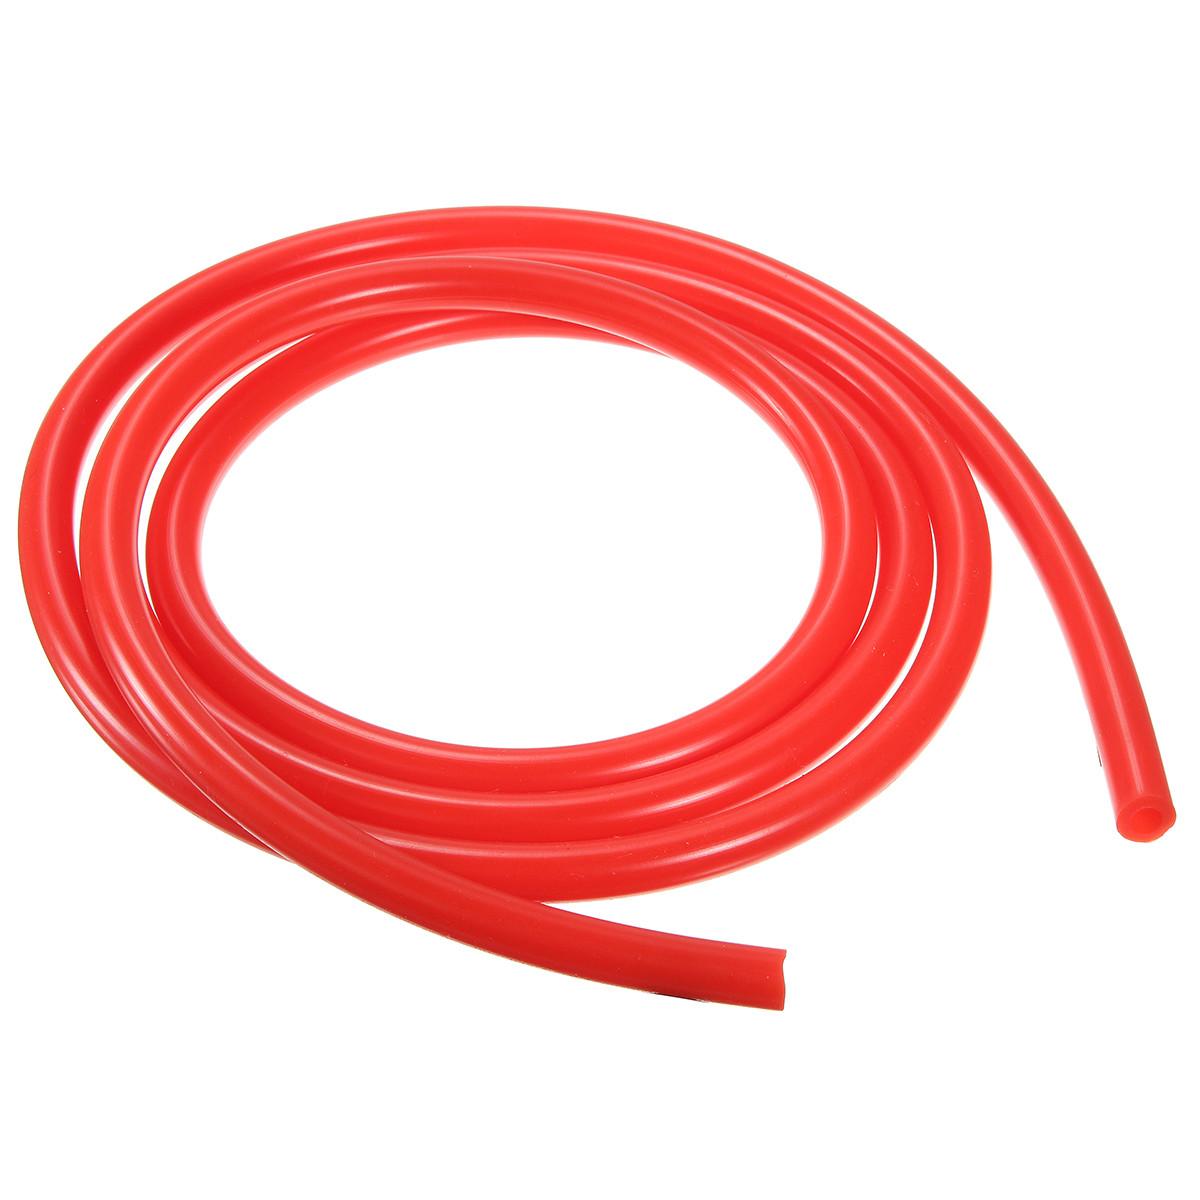 Трубка ПВХ под быстросъемы 10 х 7,5 мм красная (1 м)